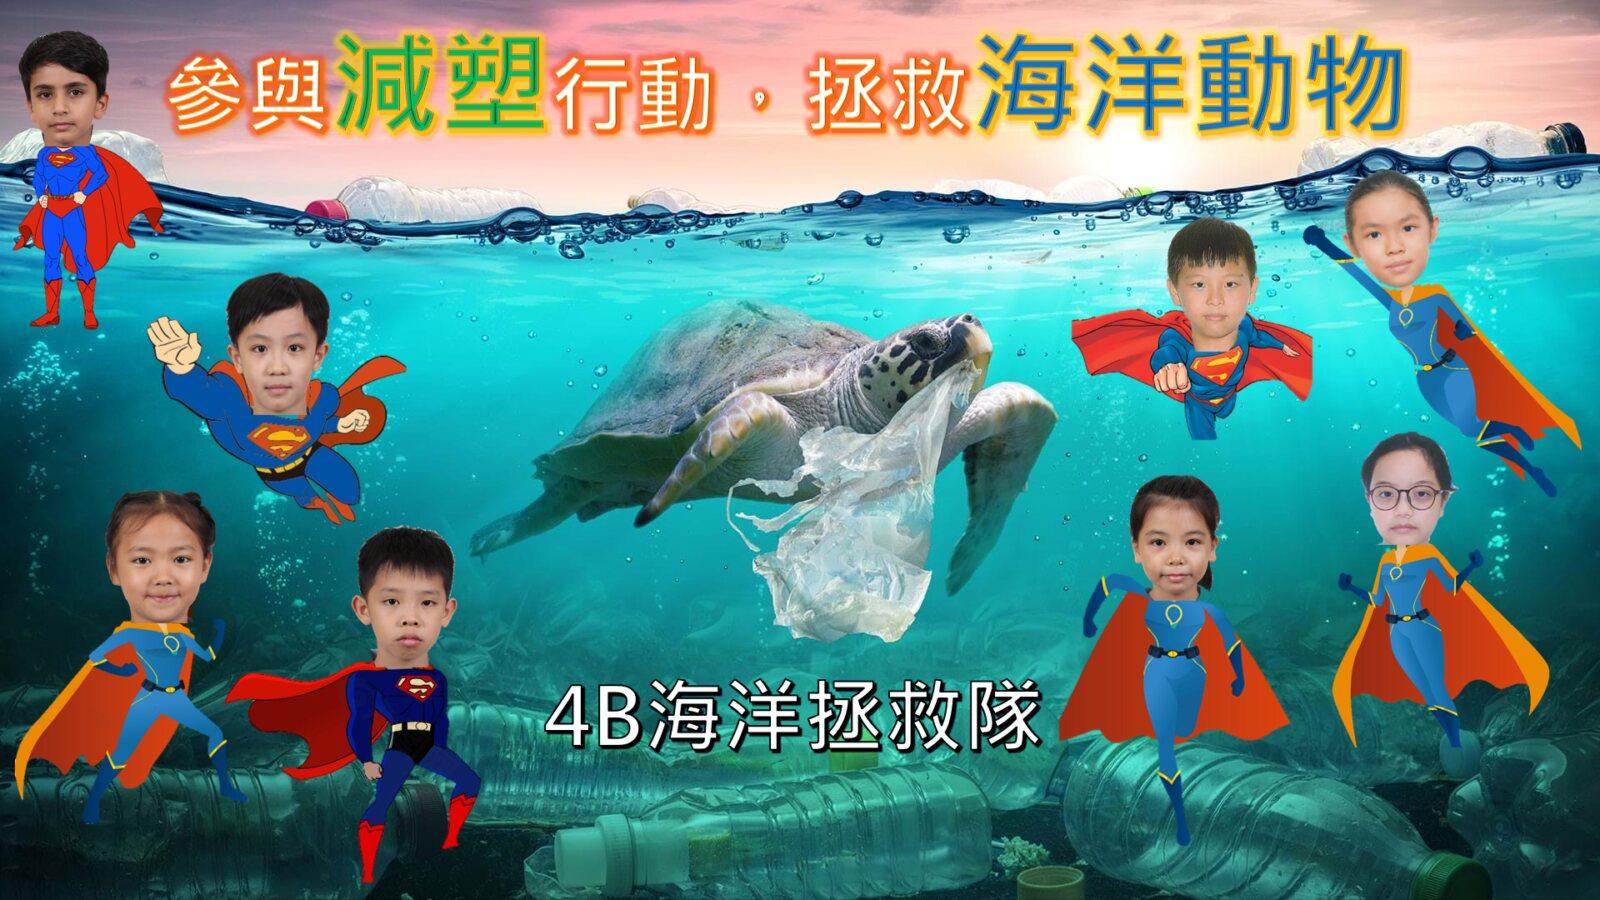 DSP_0271B3 海洋動物拯救隊